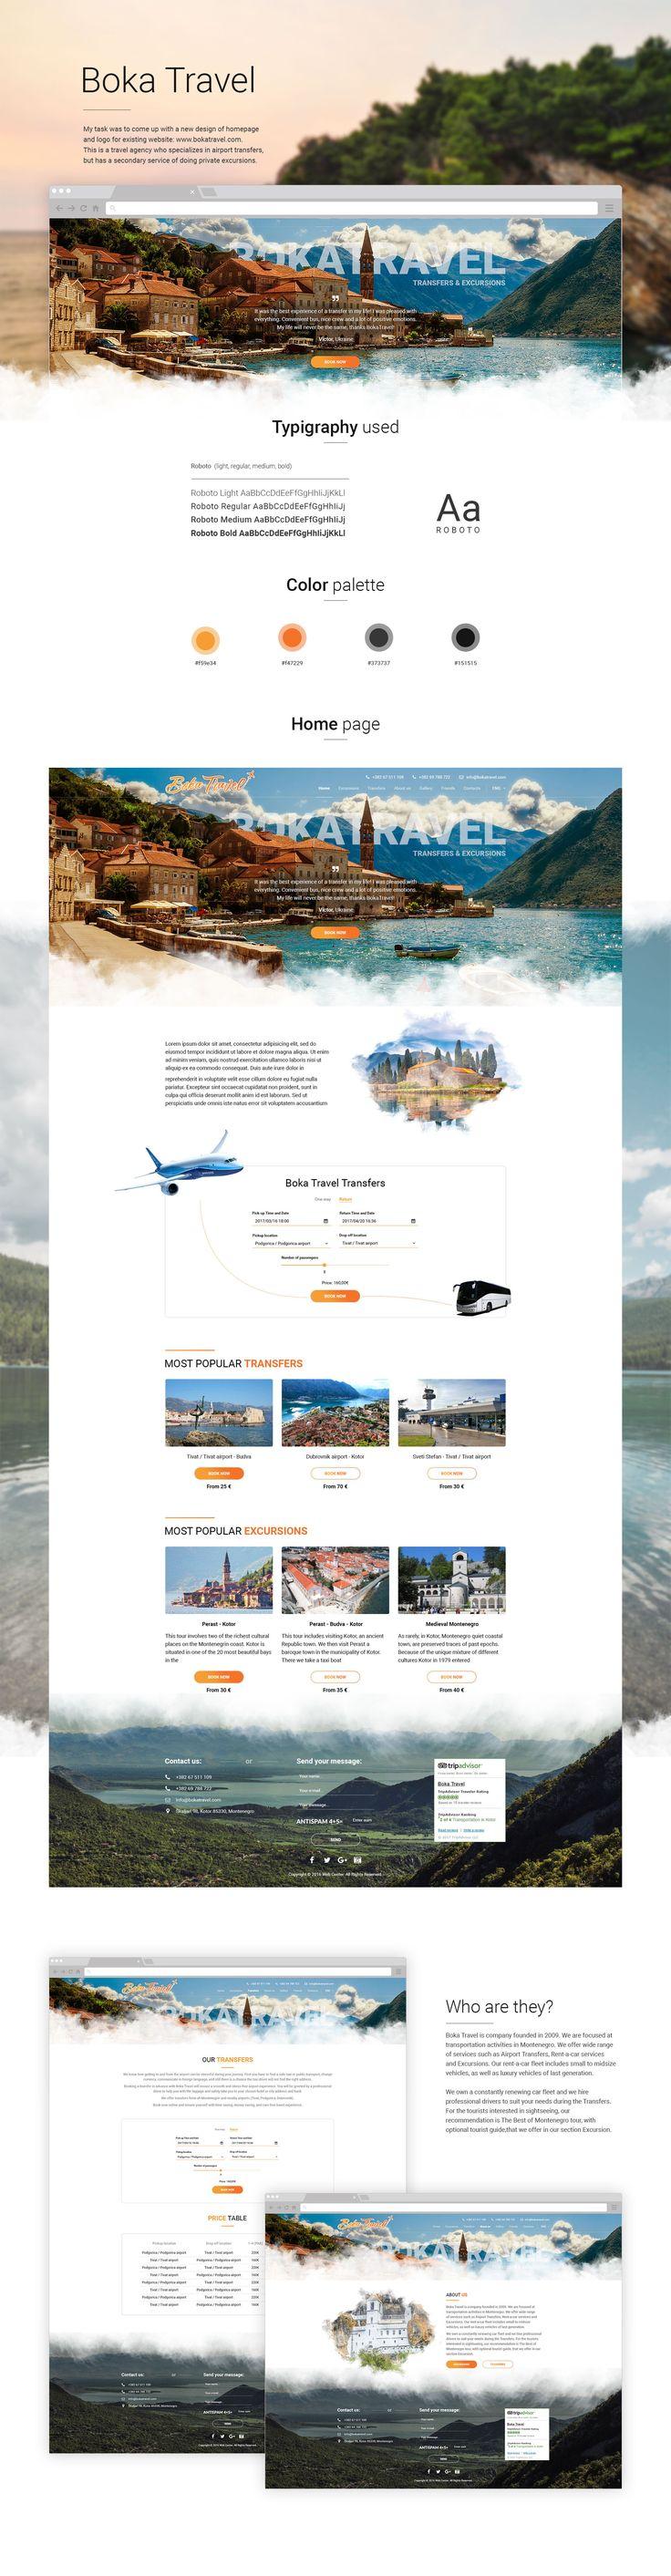 Ознакомьтесь с моим проектом @Behance: «Boka Travel - Website» https://www.behance.net/gallery/51992643/Boka-Travel-Website